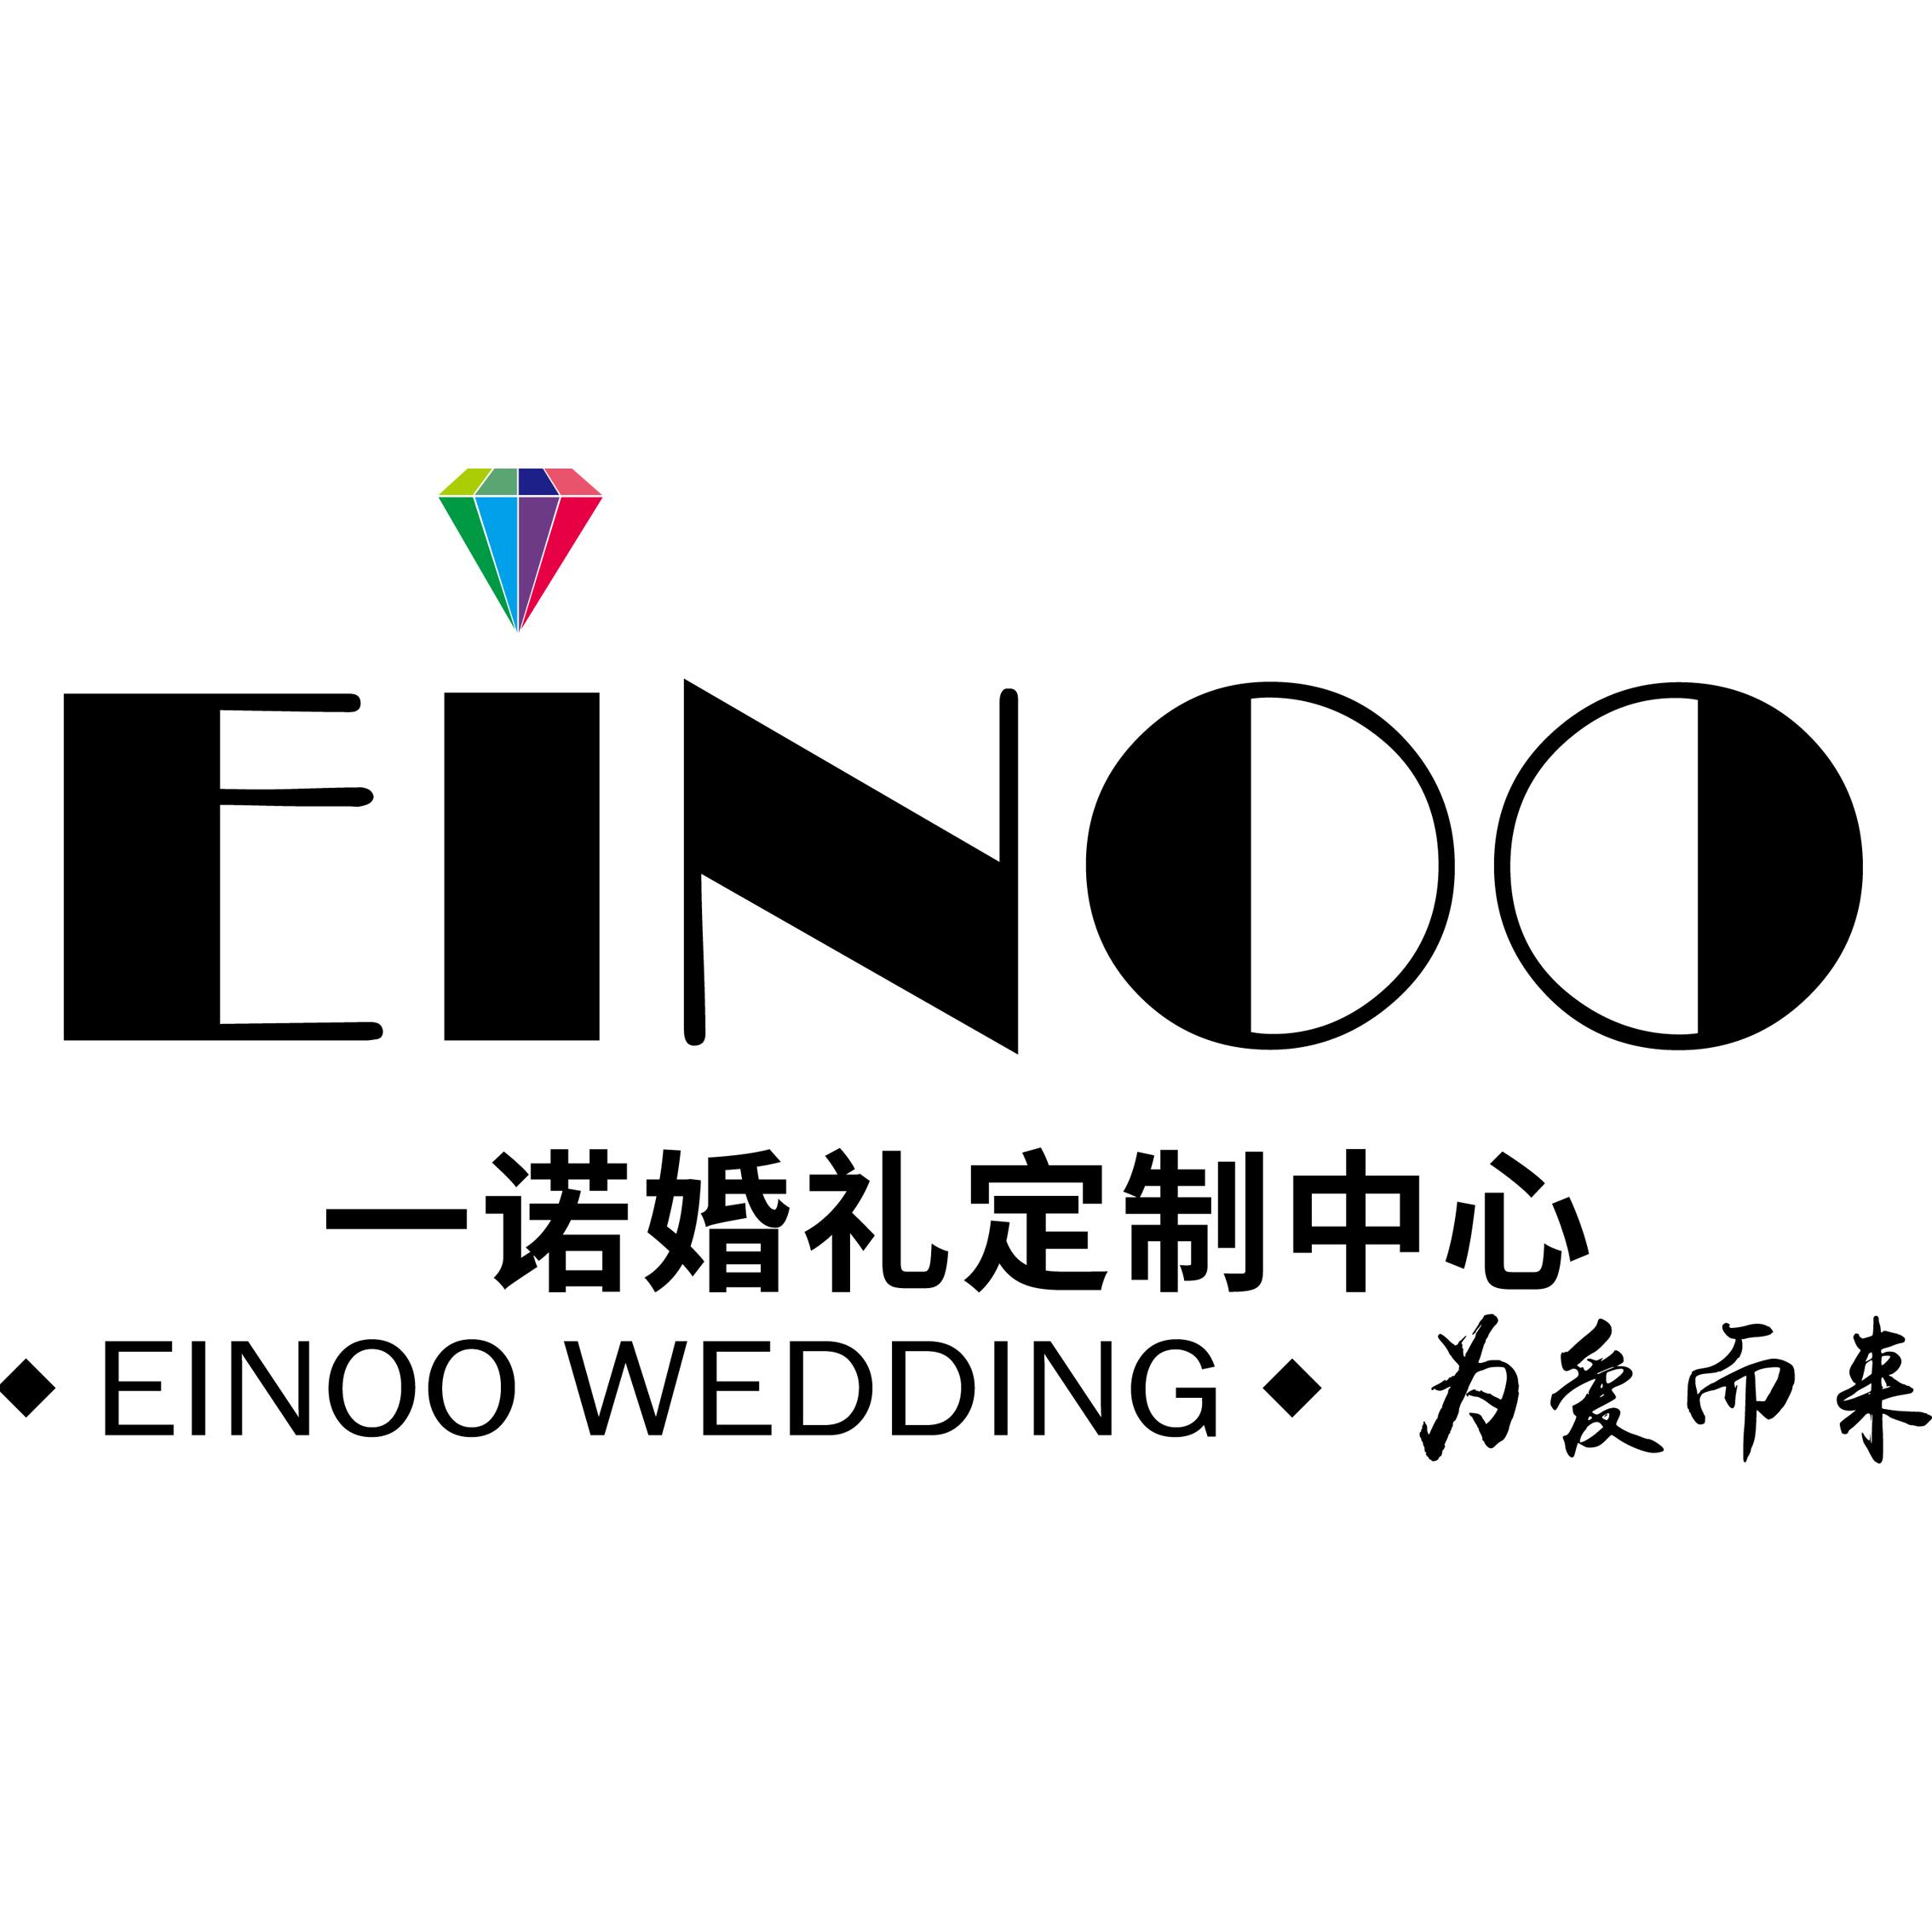 Einoo·一诺婚礼定制中心